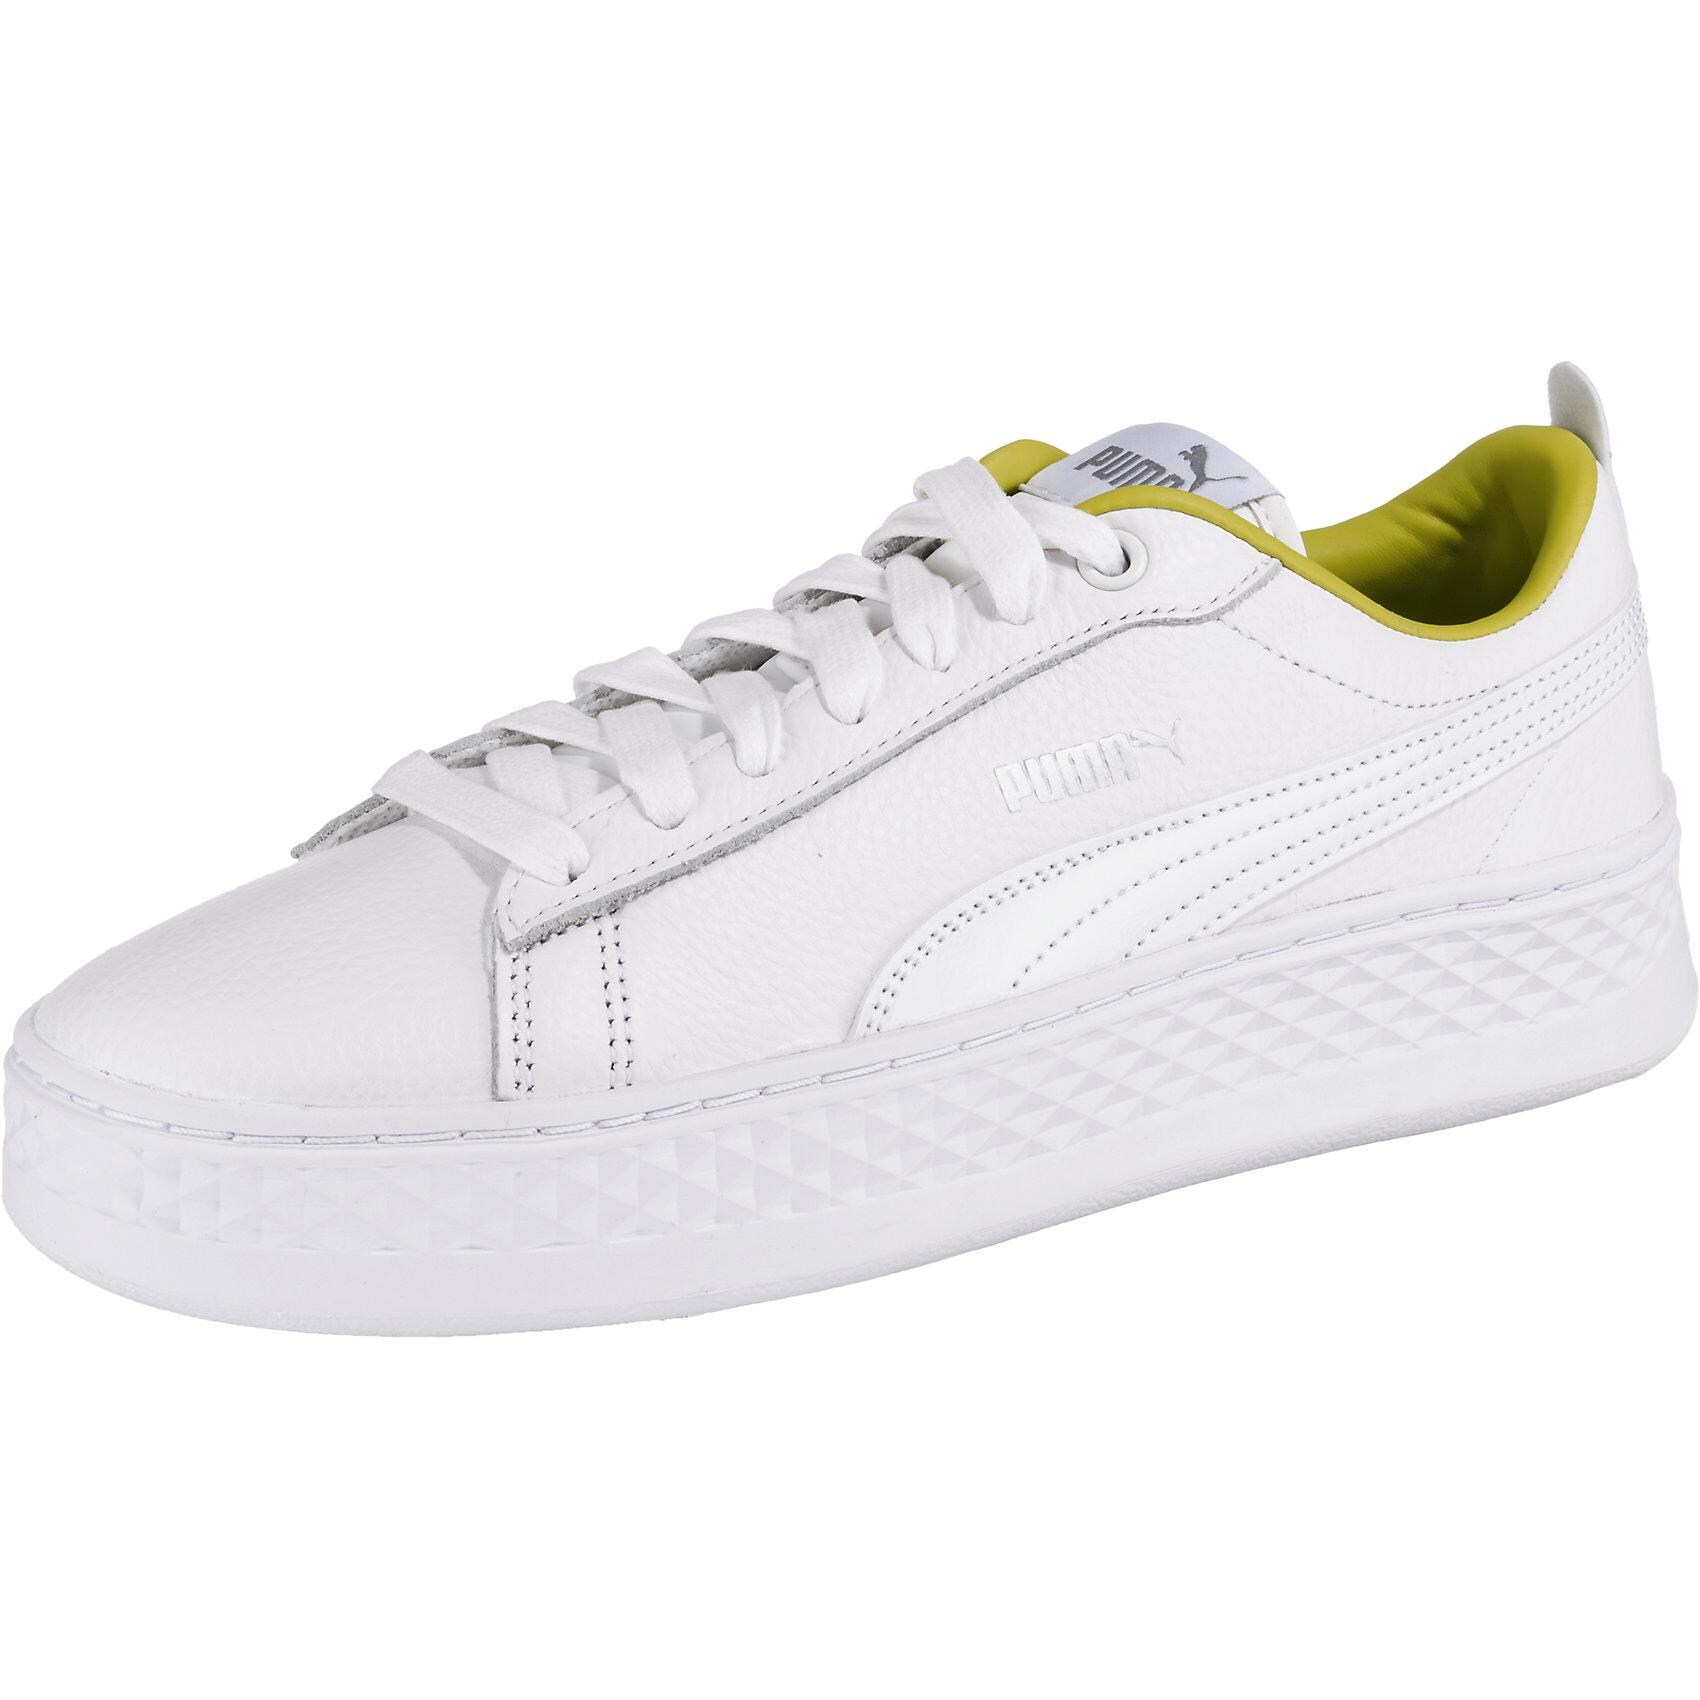 Damen Schnürschuhe & Sneaker online bestellen » REWE